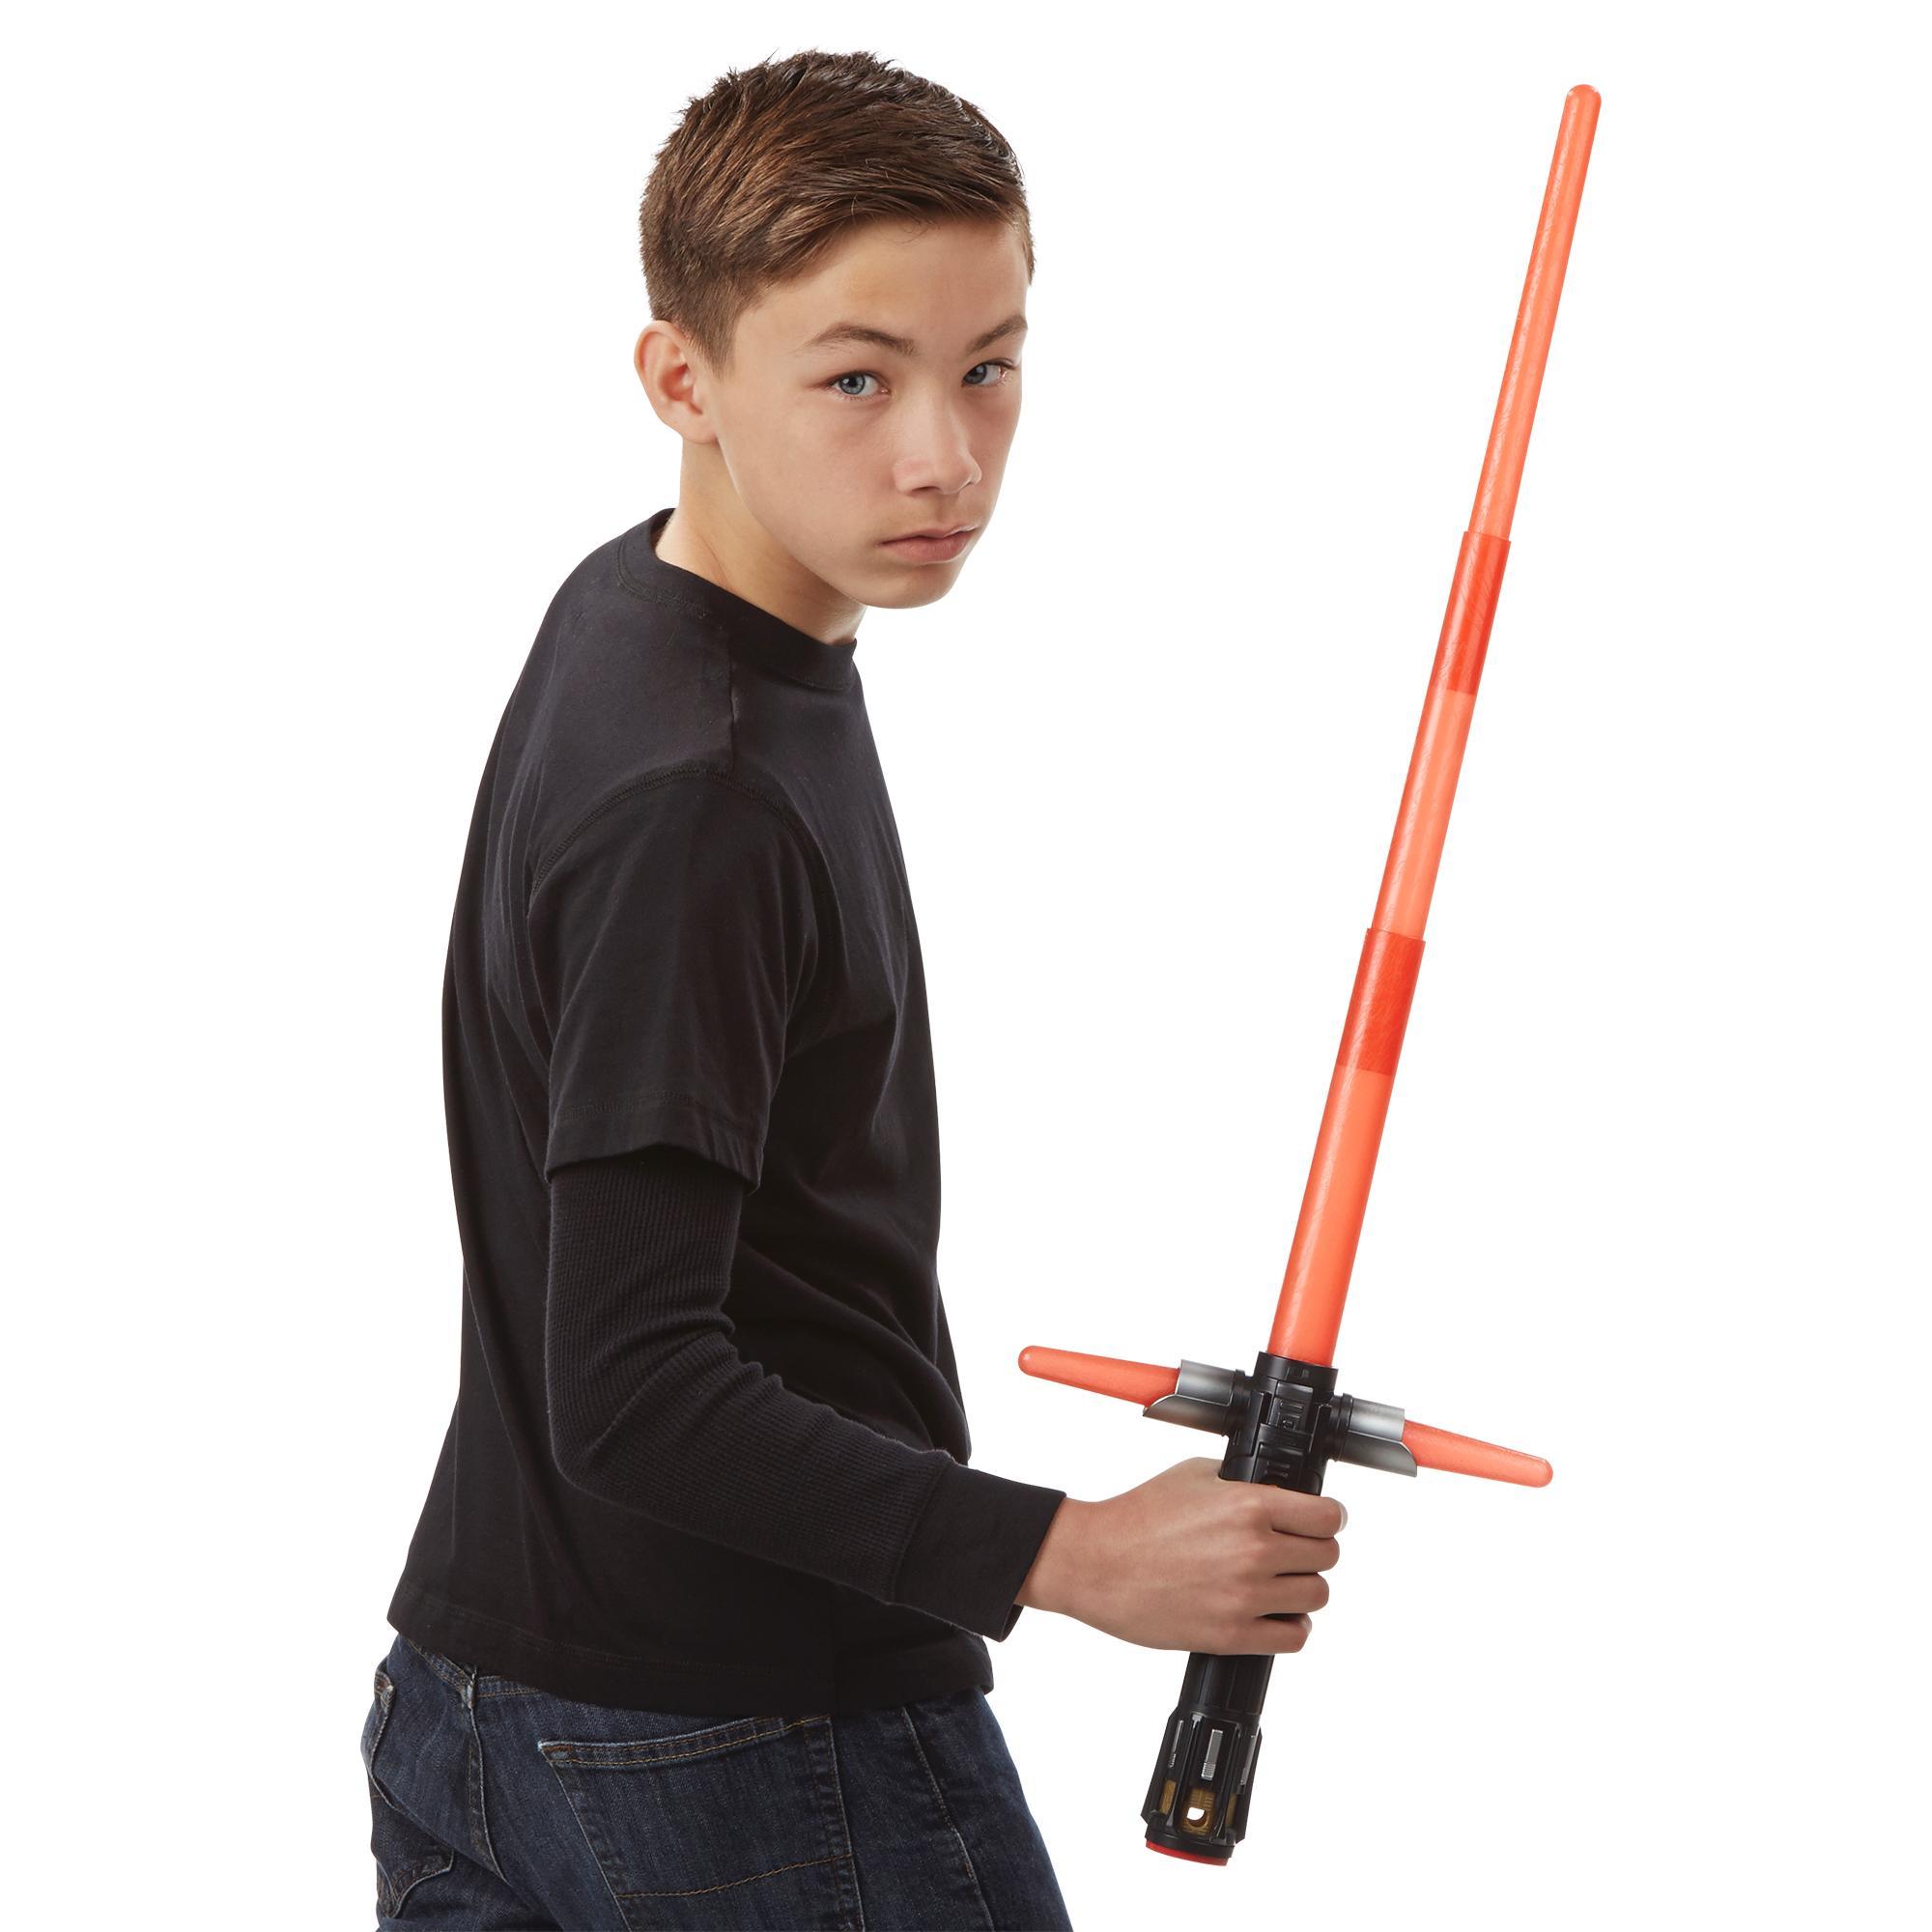 Star-Wars-The-Force-Awakens-Kylo-Ren-Deluxe-Electronic-Lightsaber thumbnail 5